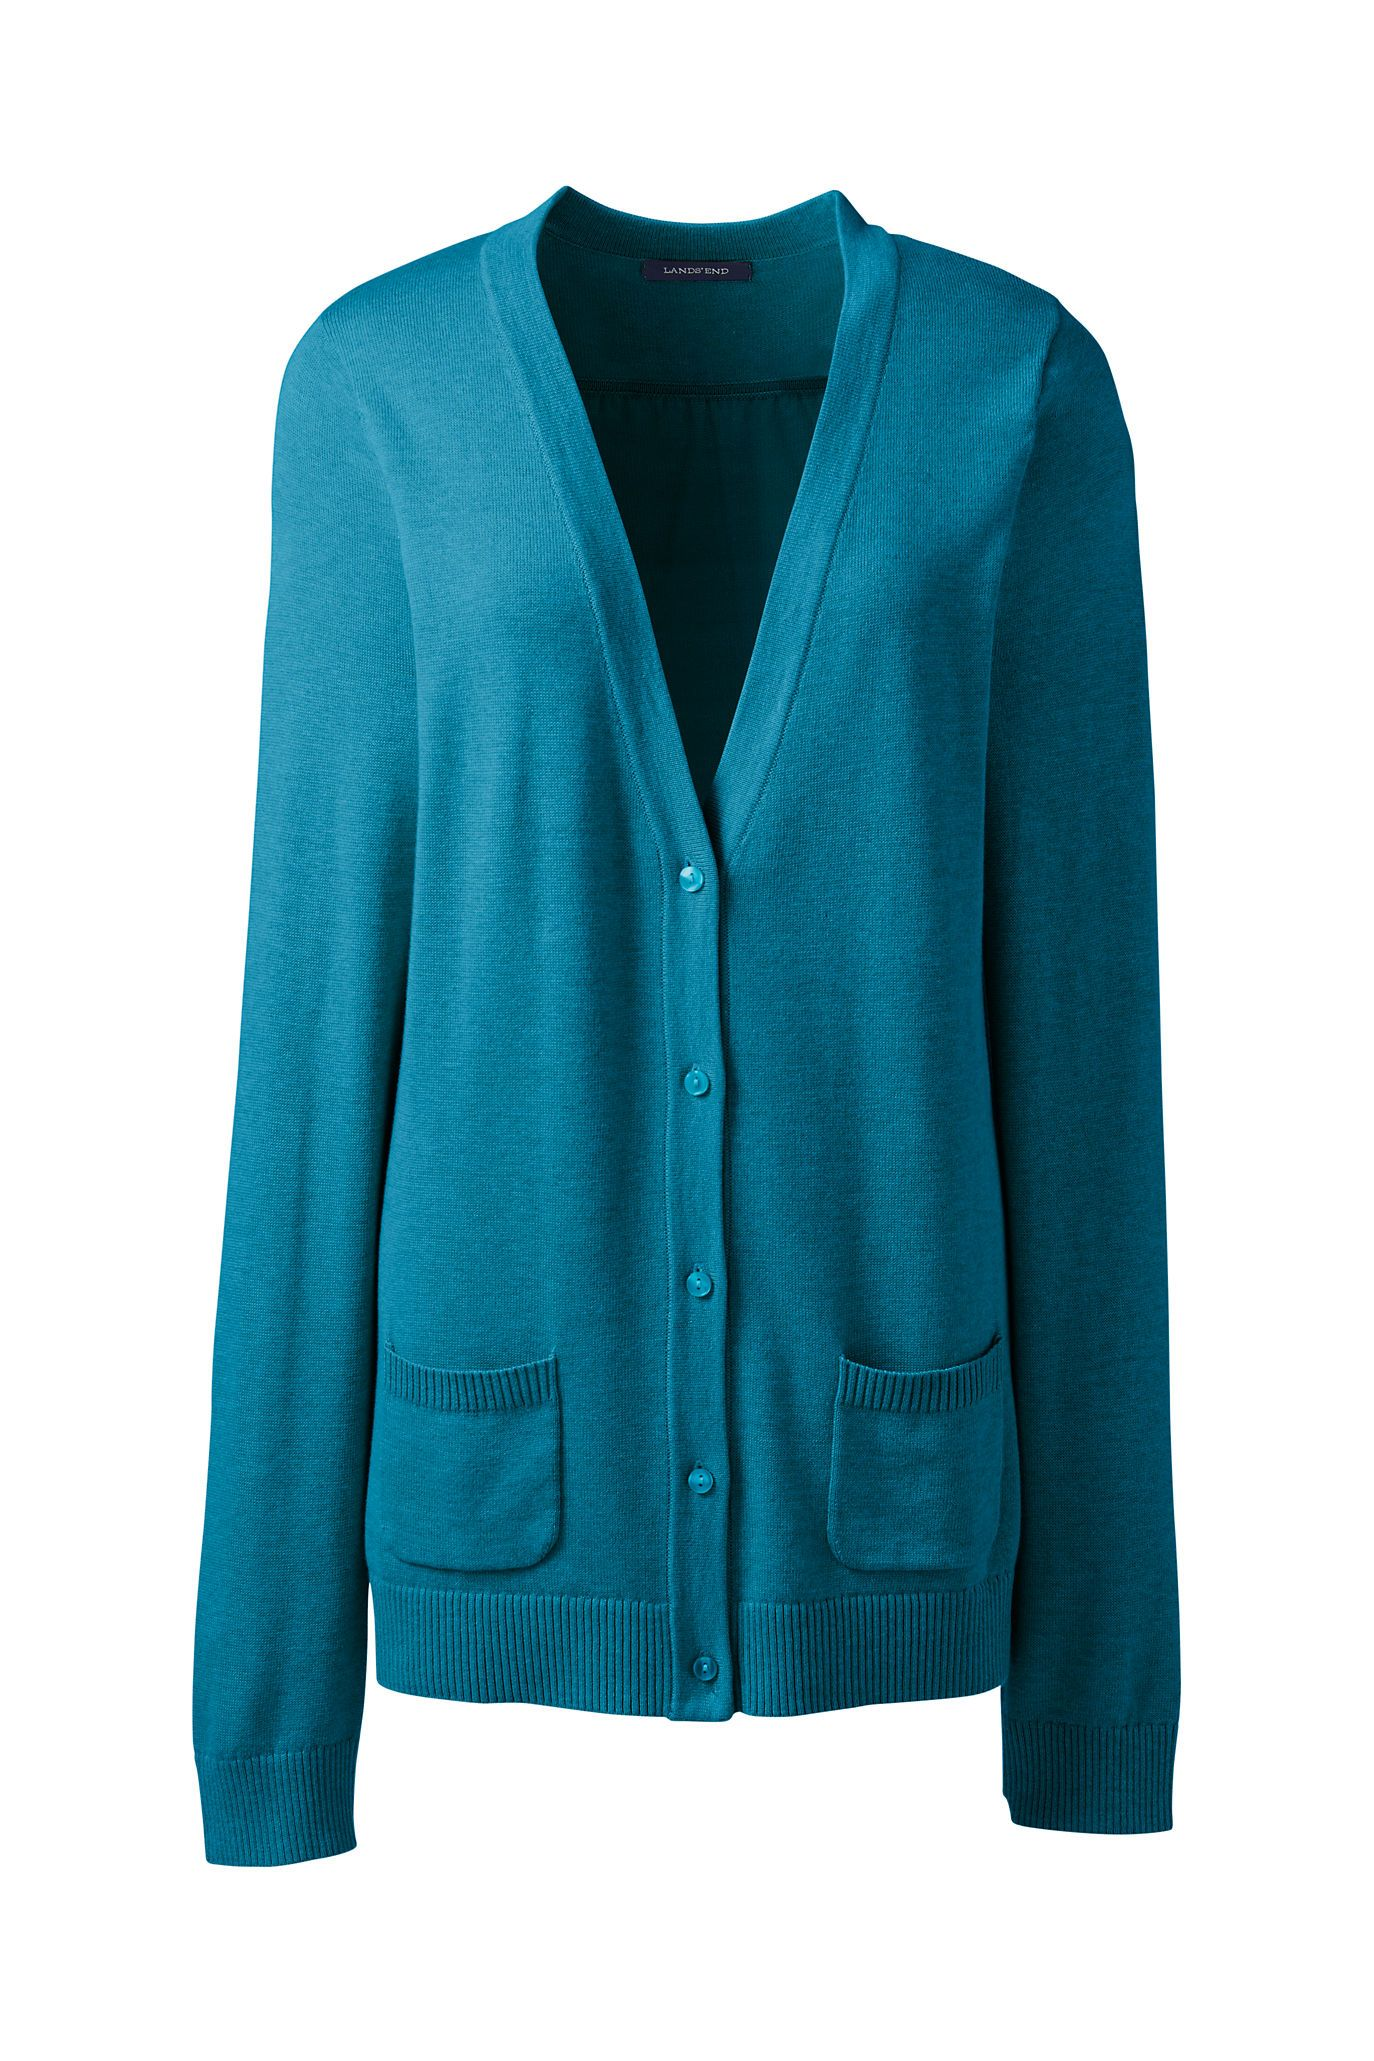 Women's Regular Cotton Modal Cardigan Sweater | Spring Capsule ...